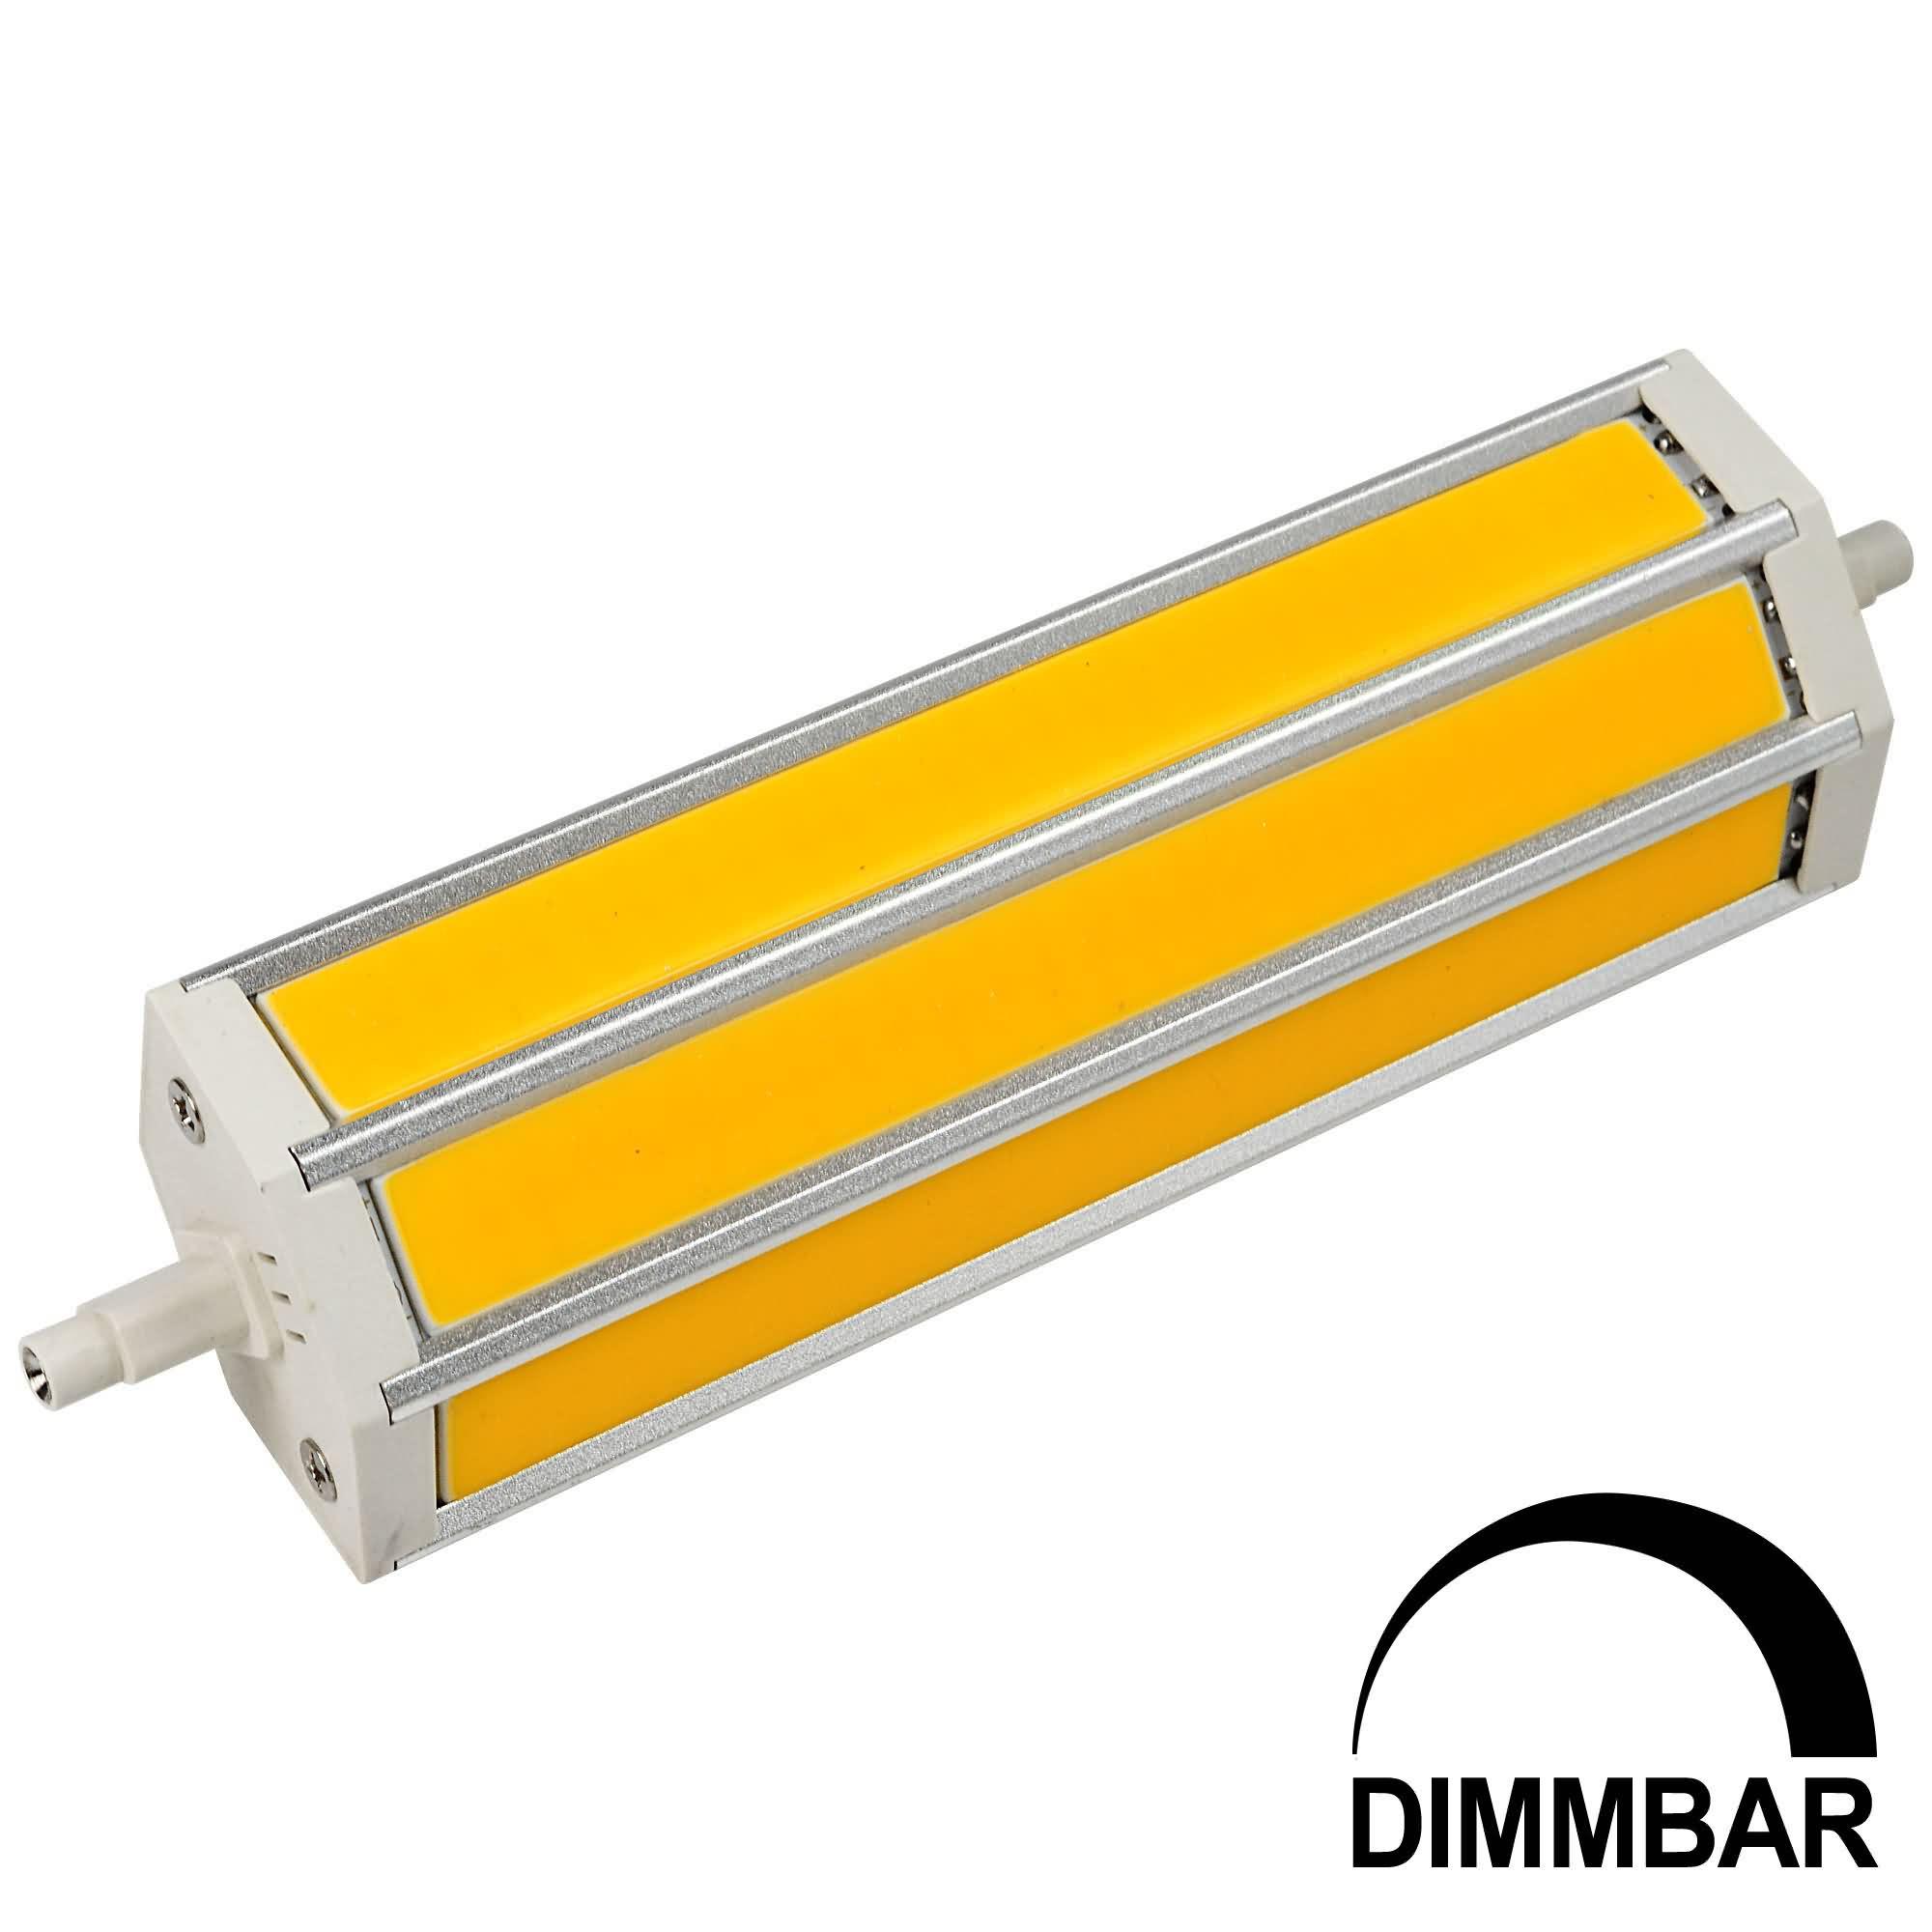 MENGS® R7S J189 15W LED Dimmable Flood Light 3 COB LED Lamp Bulb in Warm White Energy-saving Lamp